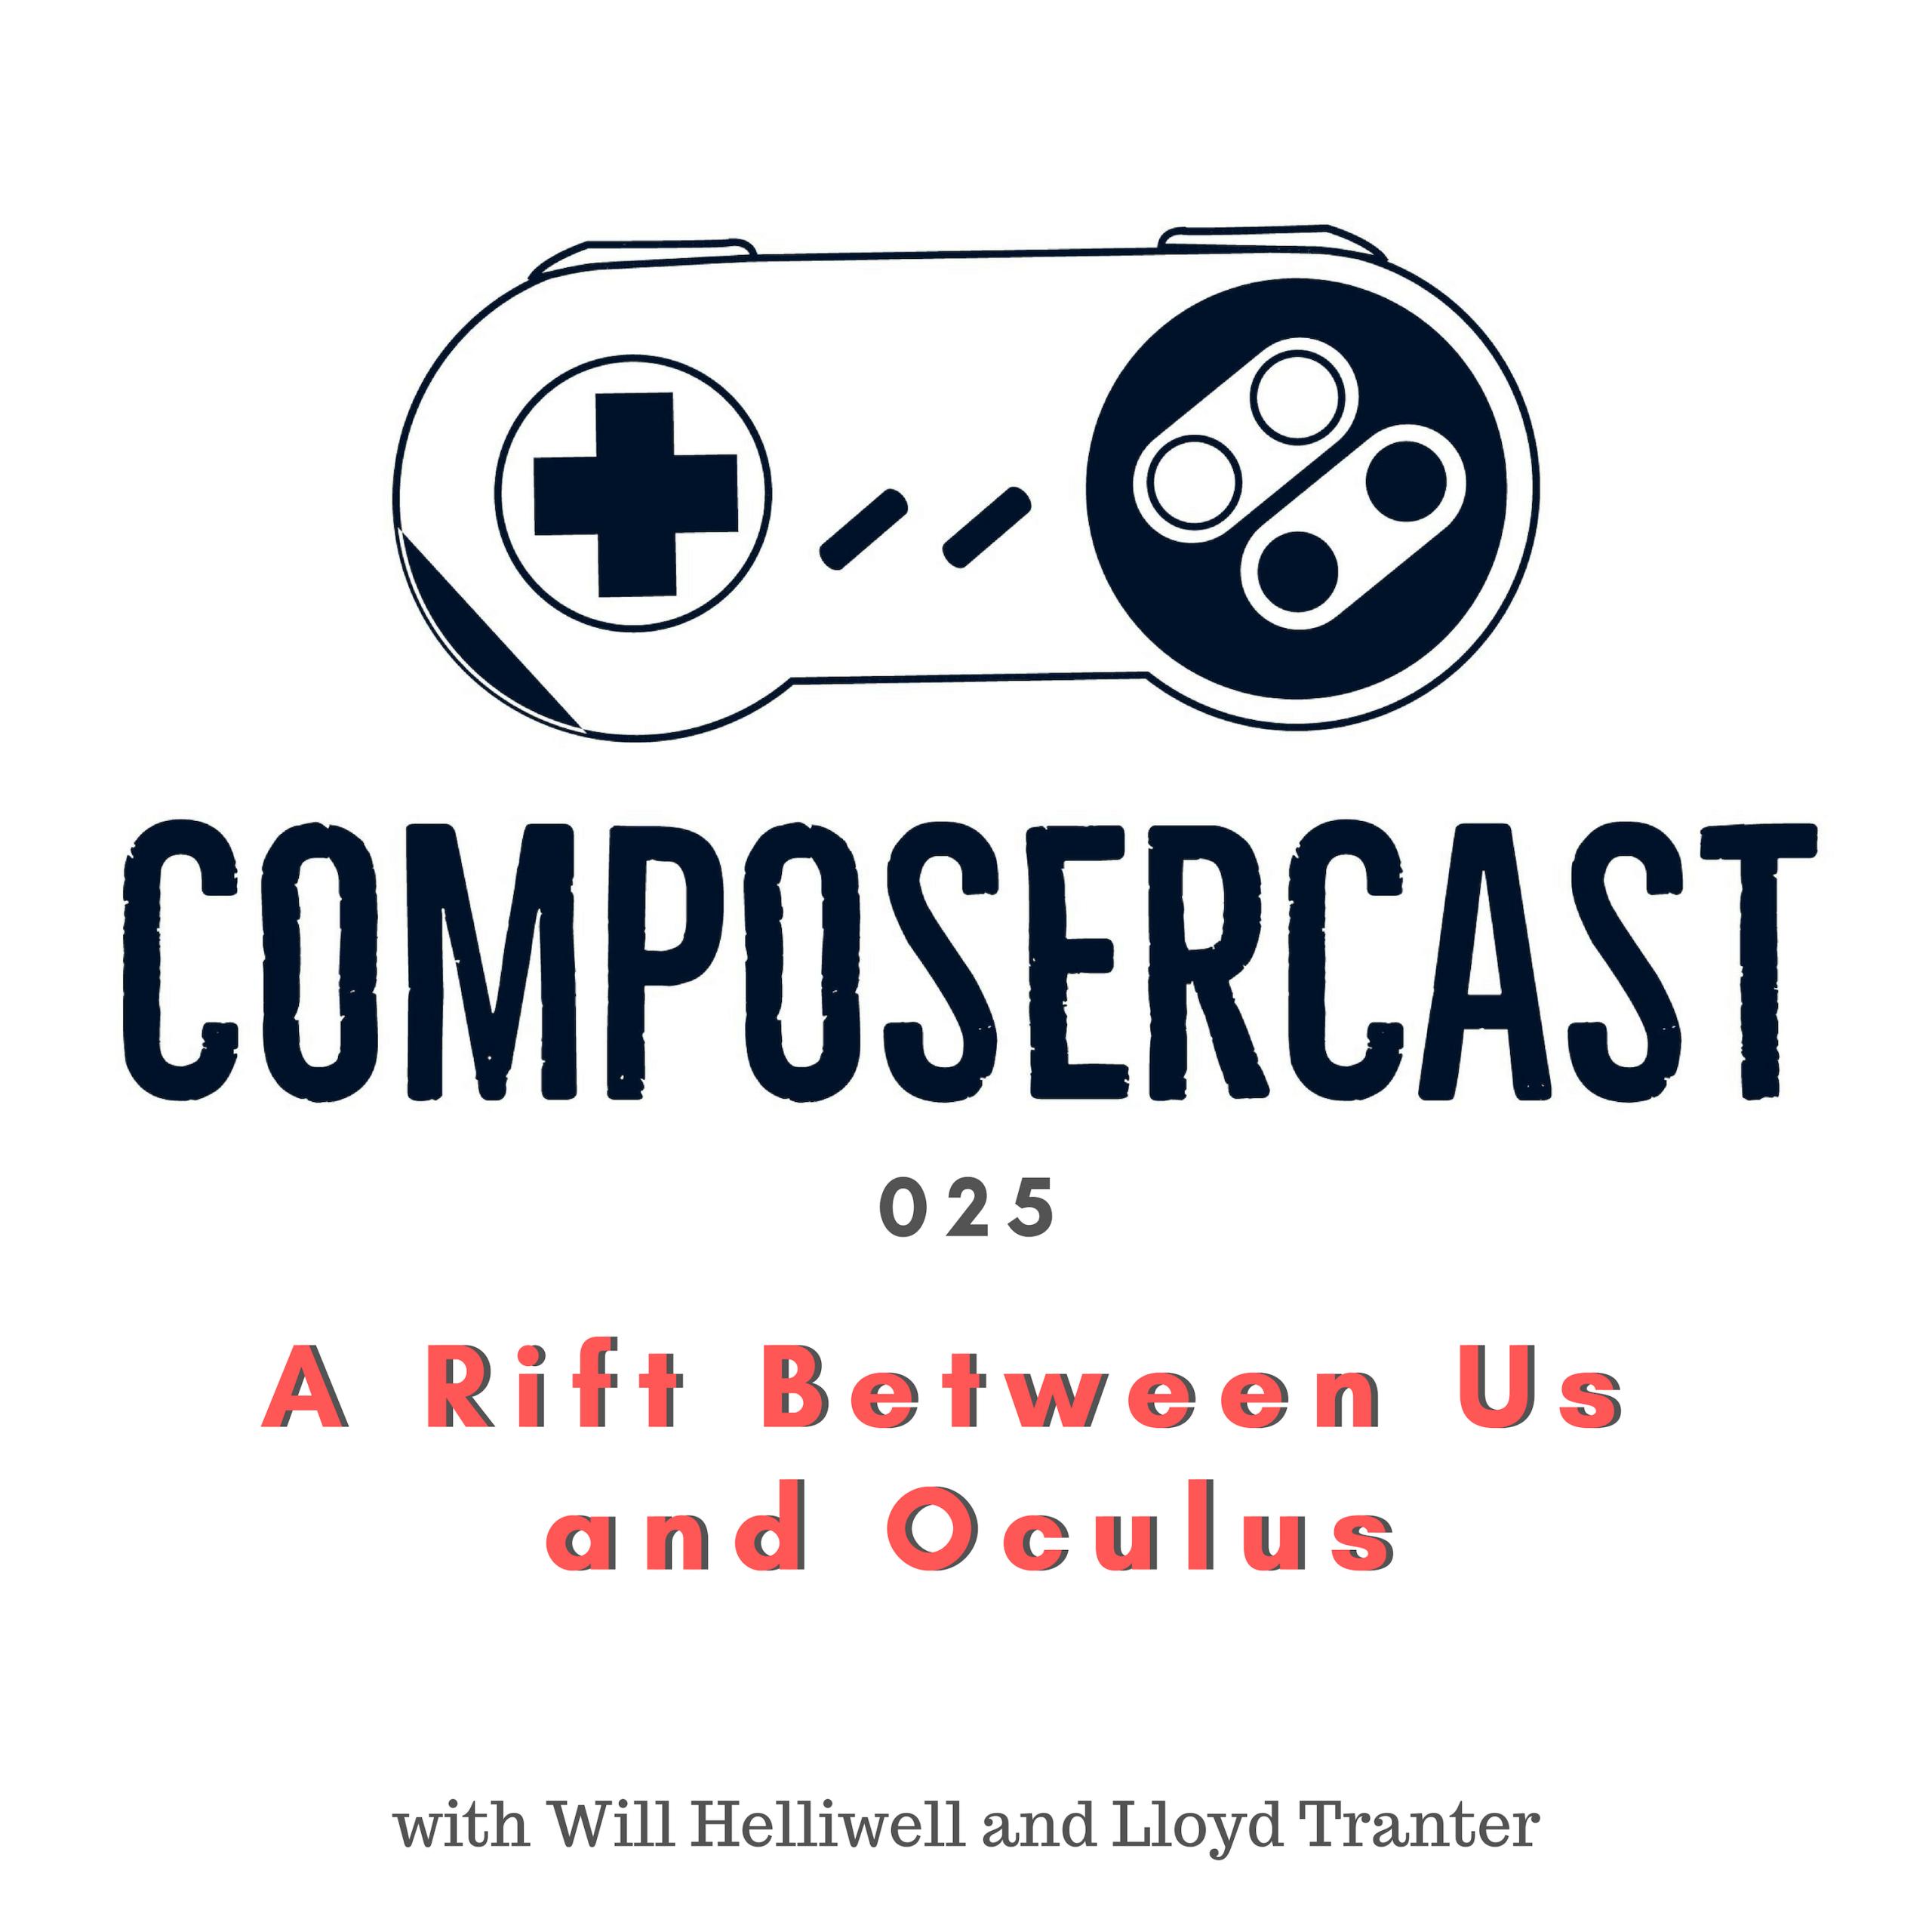 ComposerCast 025 Thumbnail